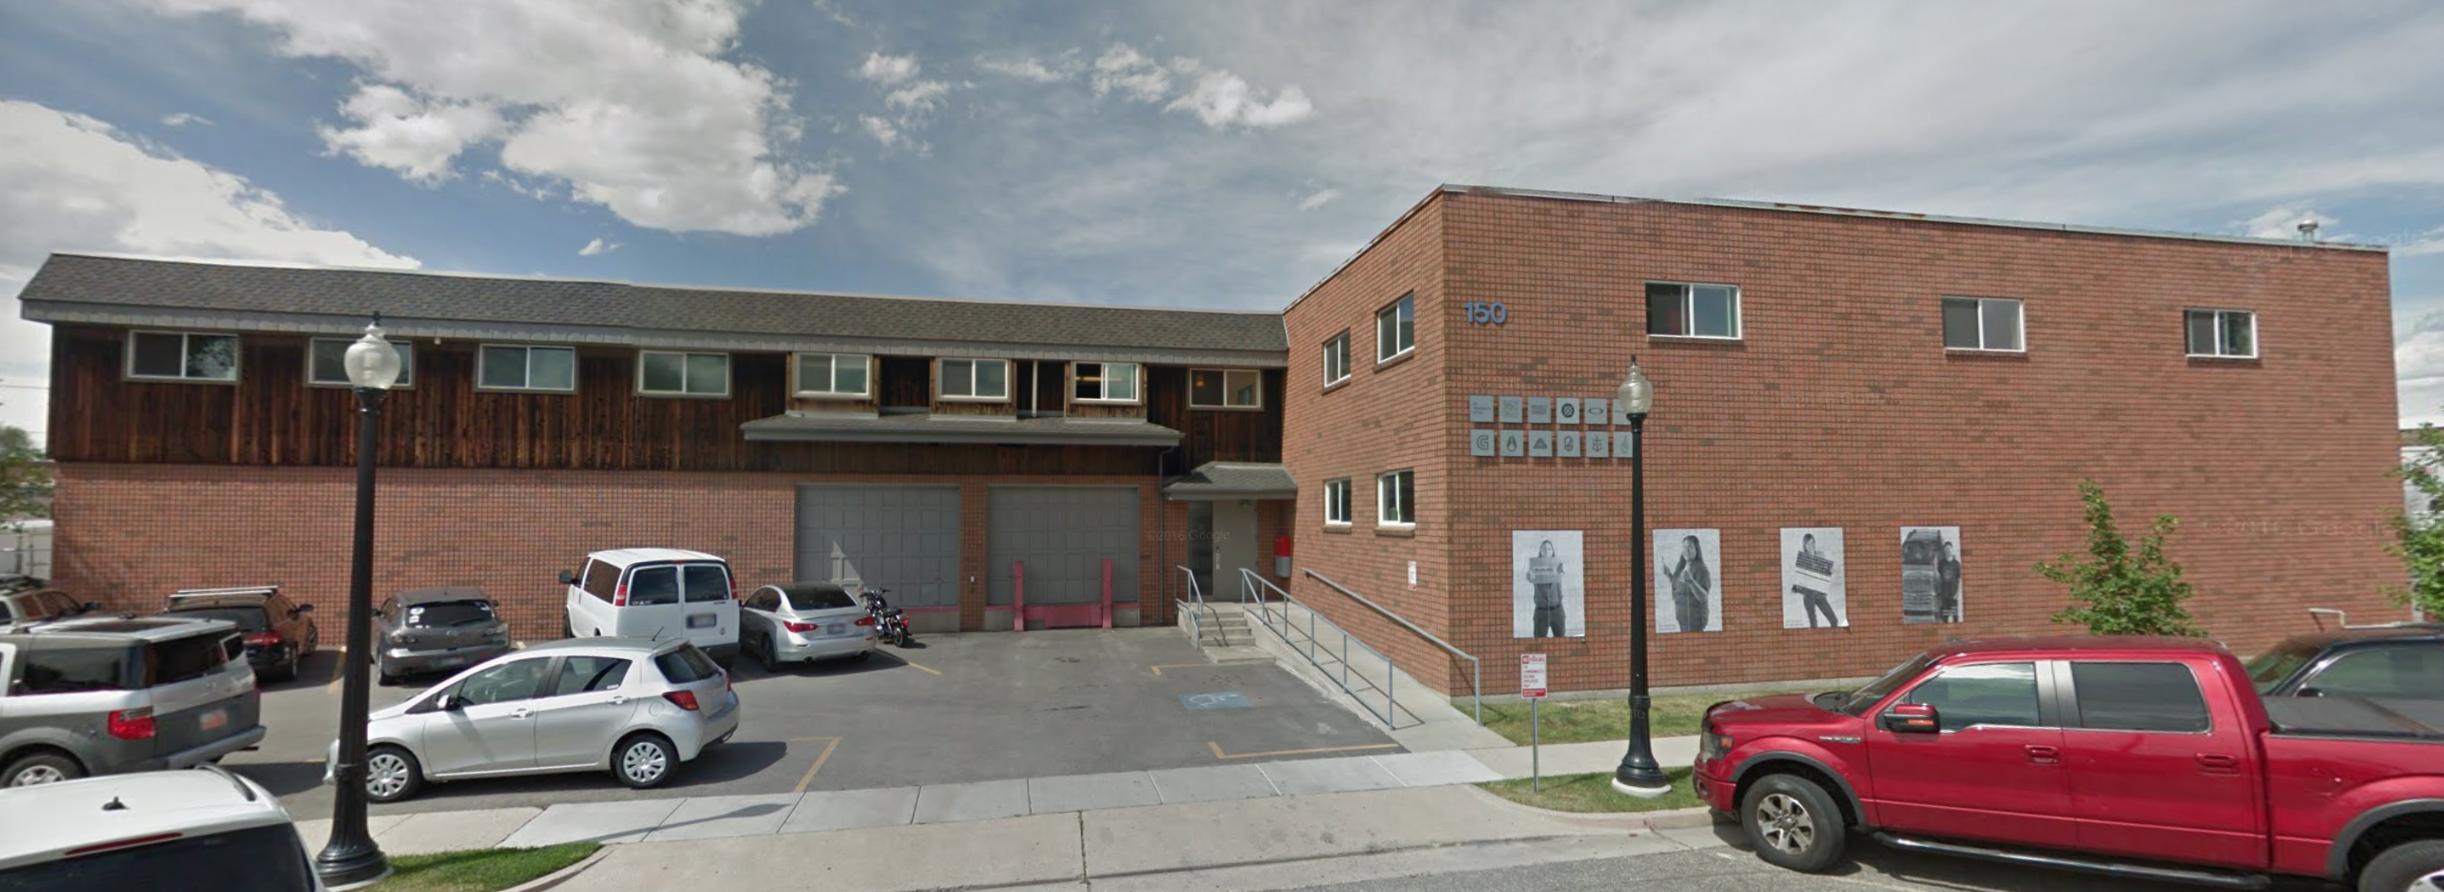 Windermere-Commercial-Real-Estate-Utah-Hip-Industrial-Creative-Office-Space1